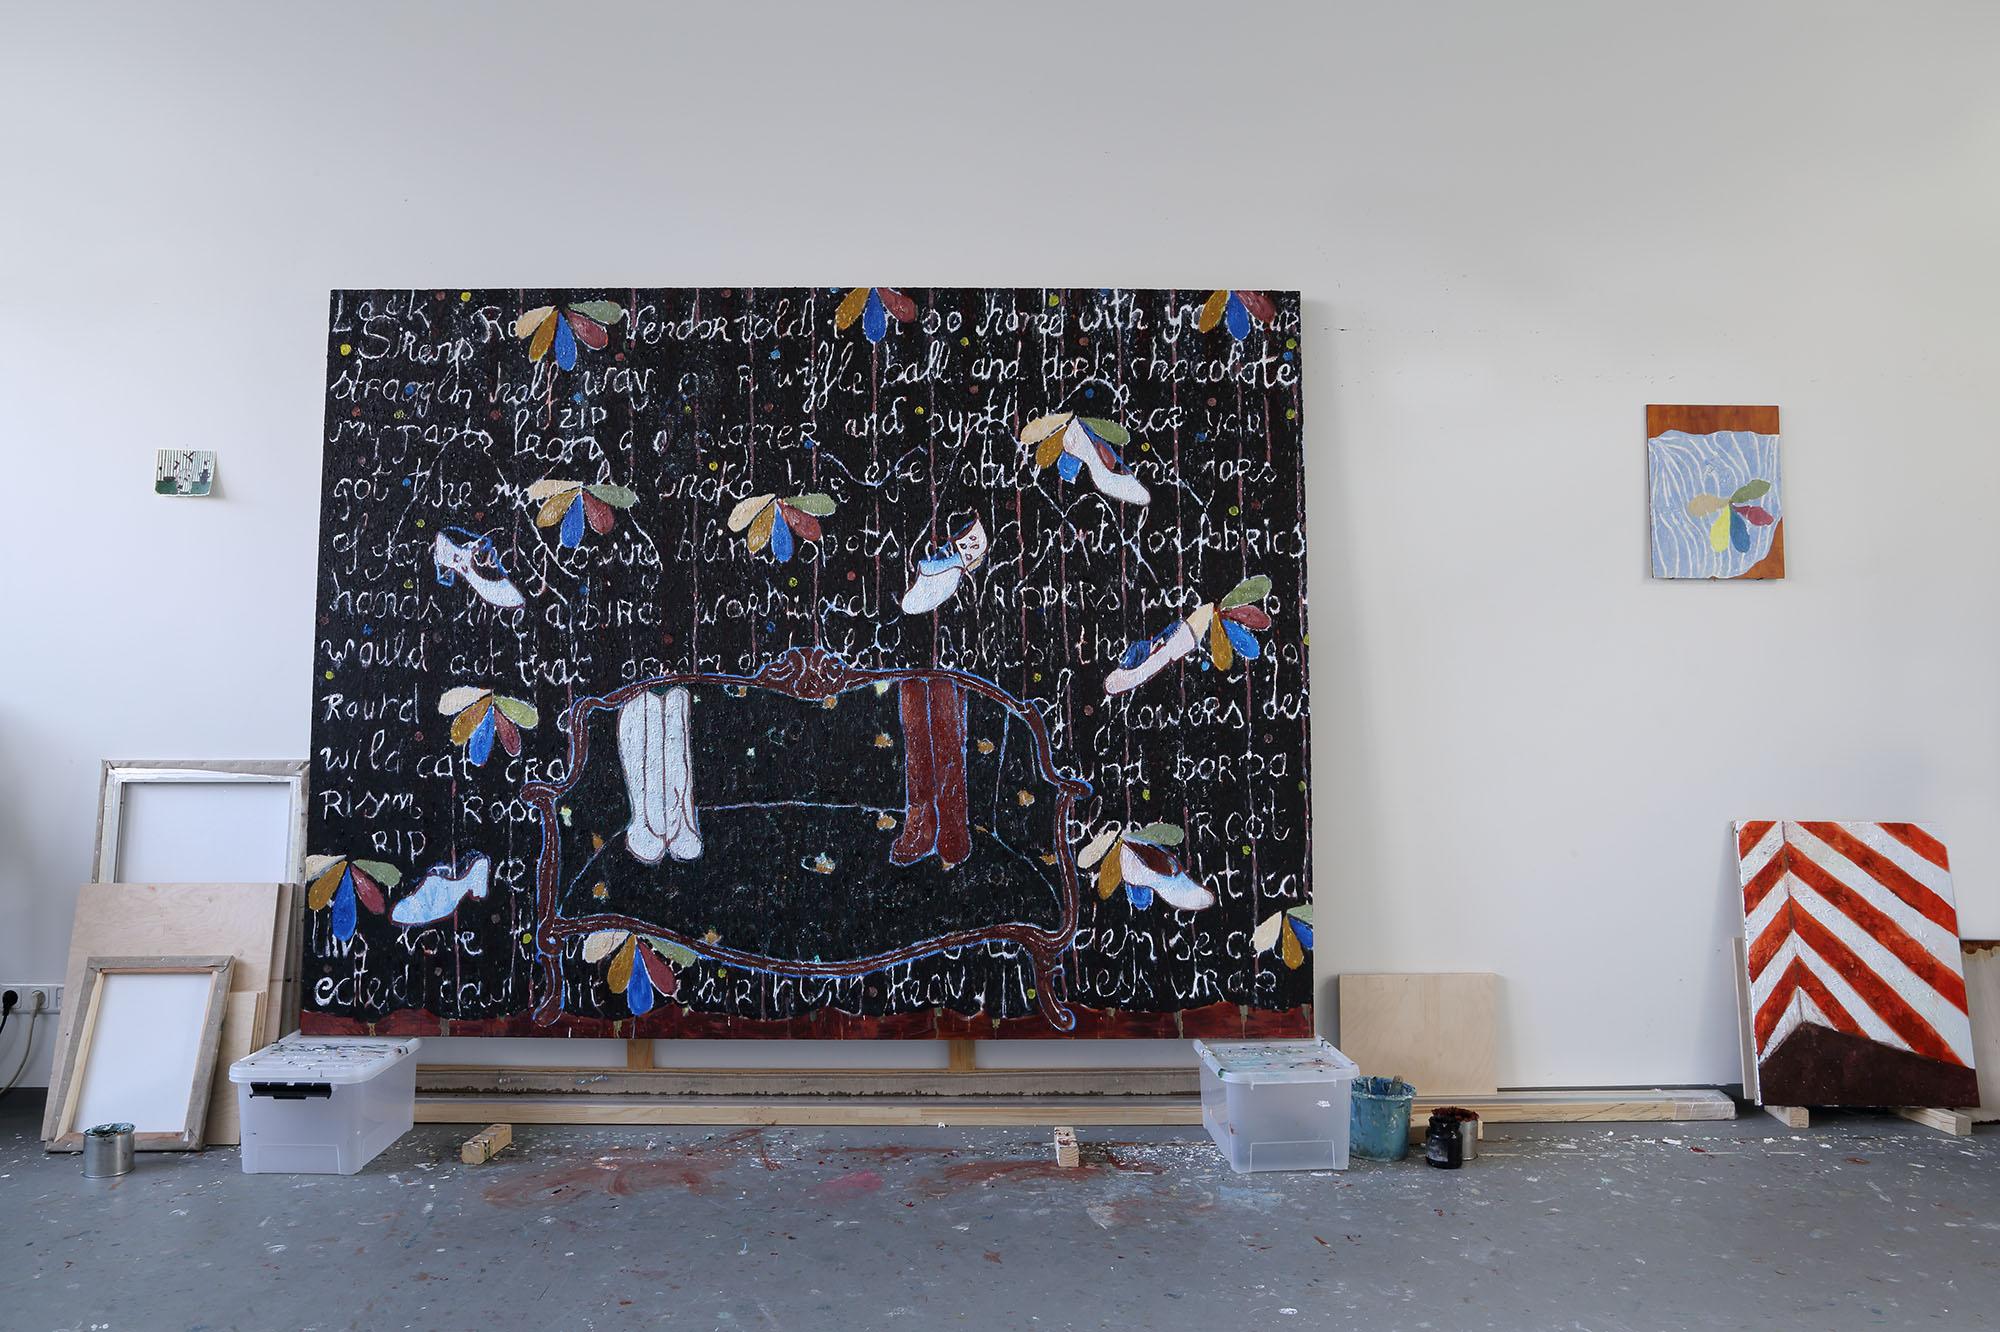 Keetje_Mans-jan-van-eyck-studio-20143.jpg